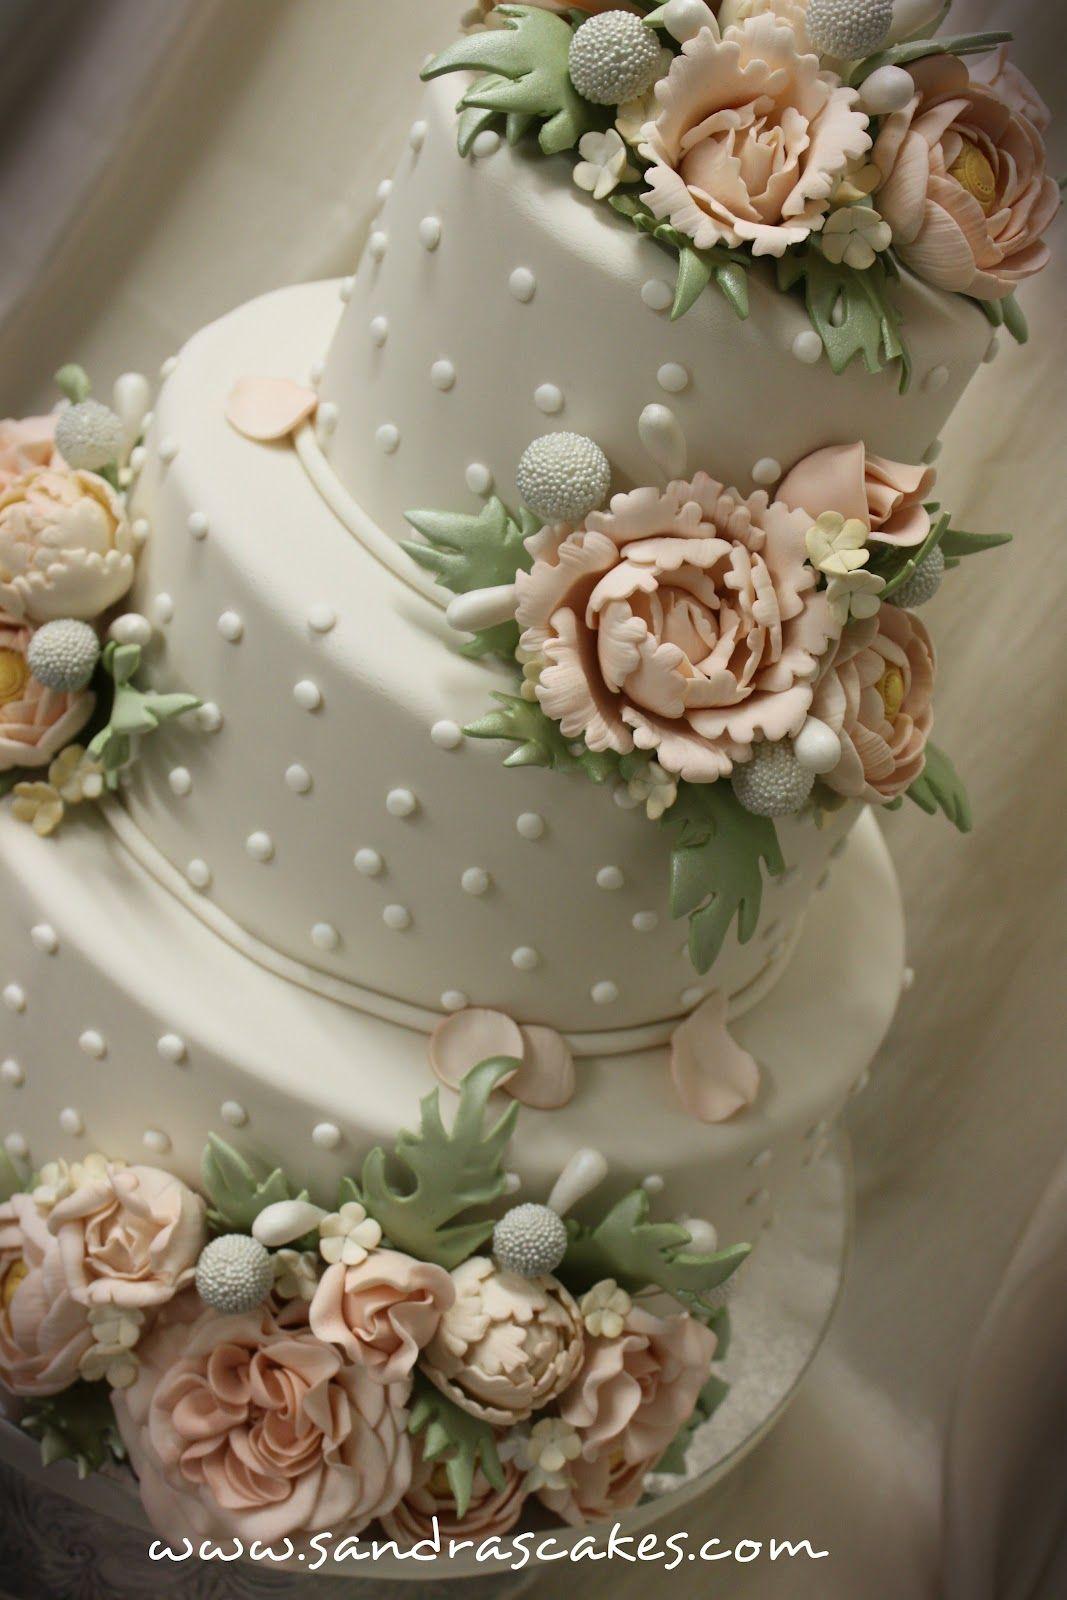 Victorian Flowers Wedding Cake by Sandra's Cakes